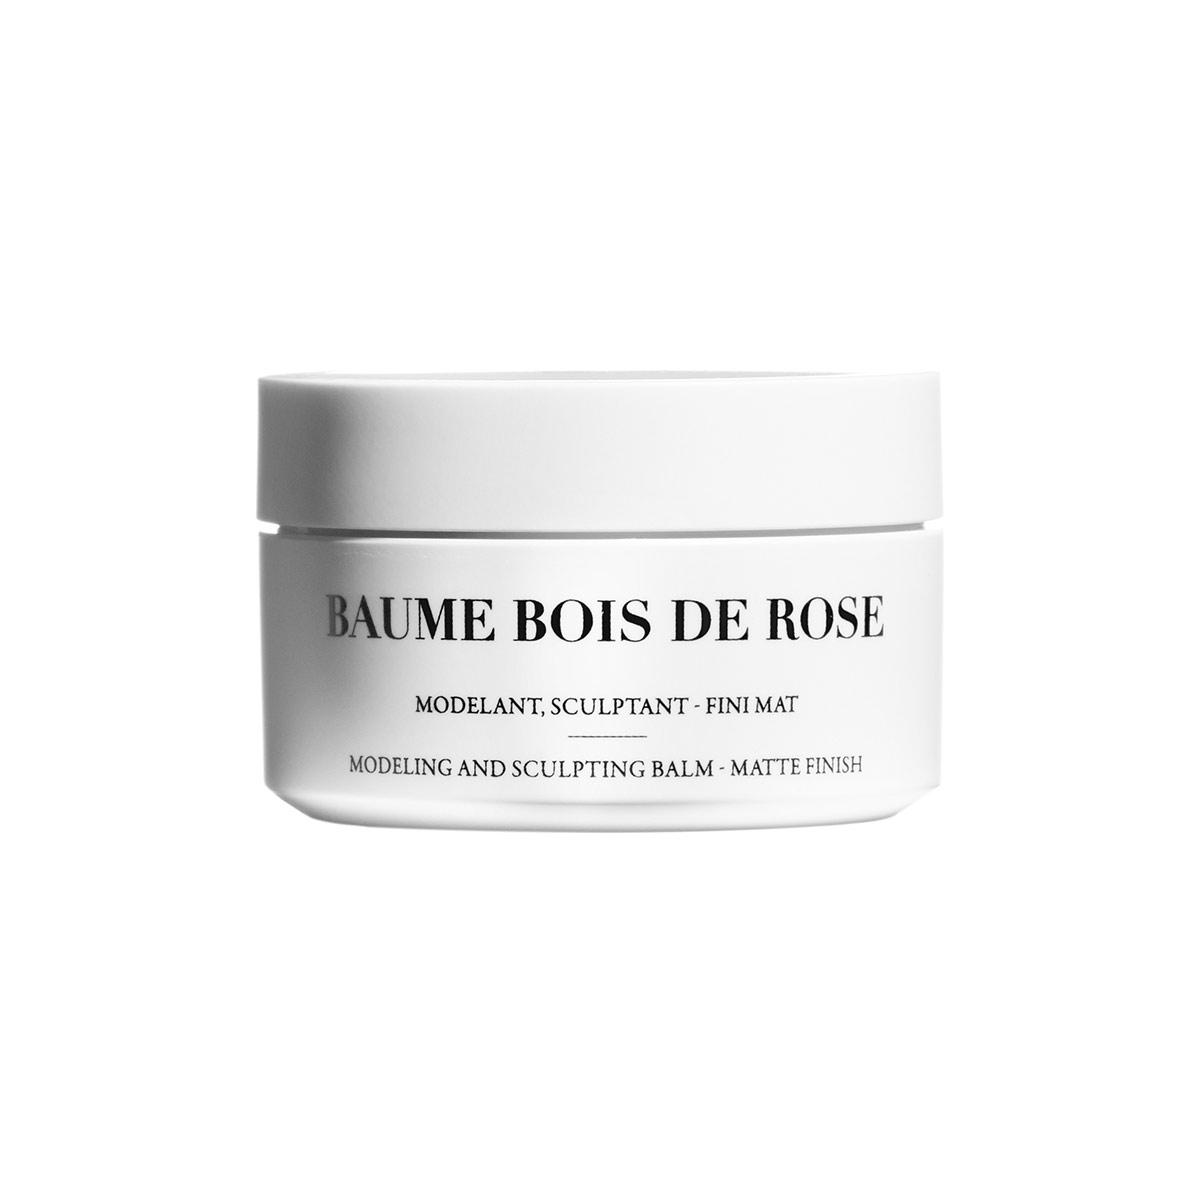 Baume Bois de Rose | Leonor Greyl